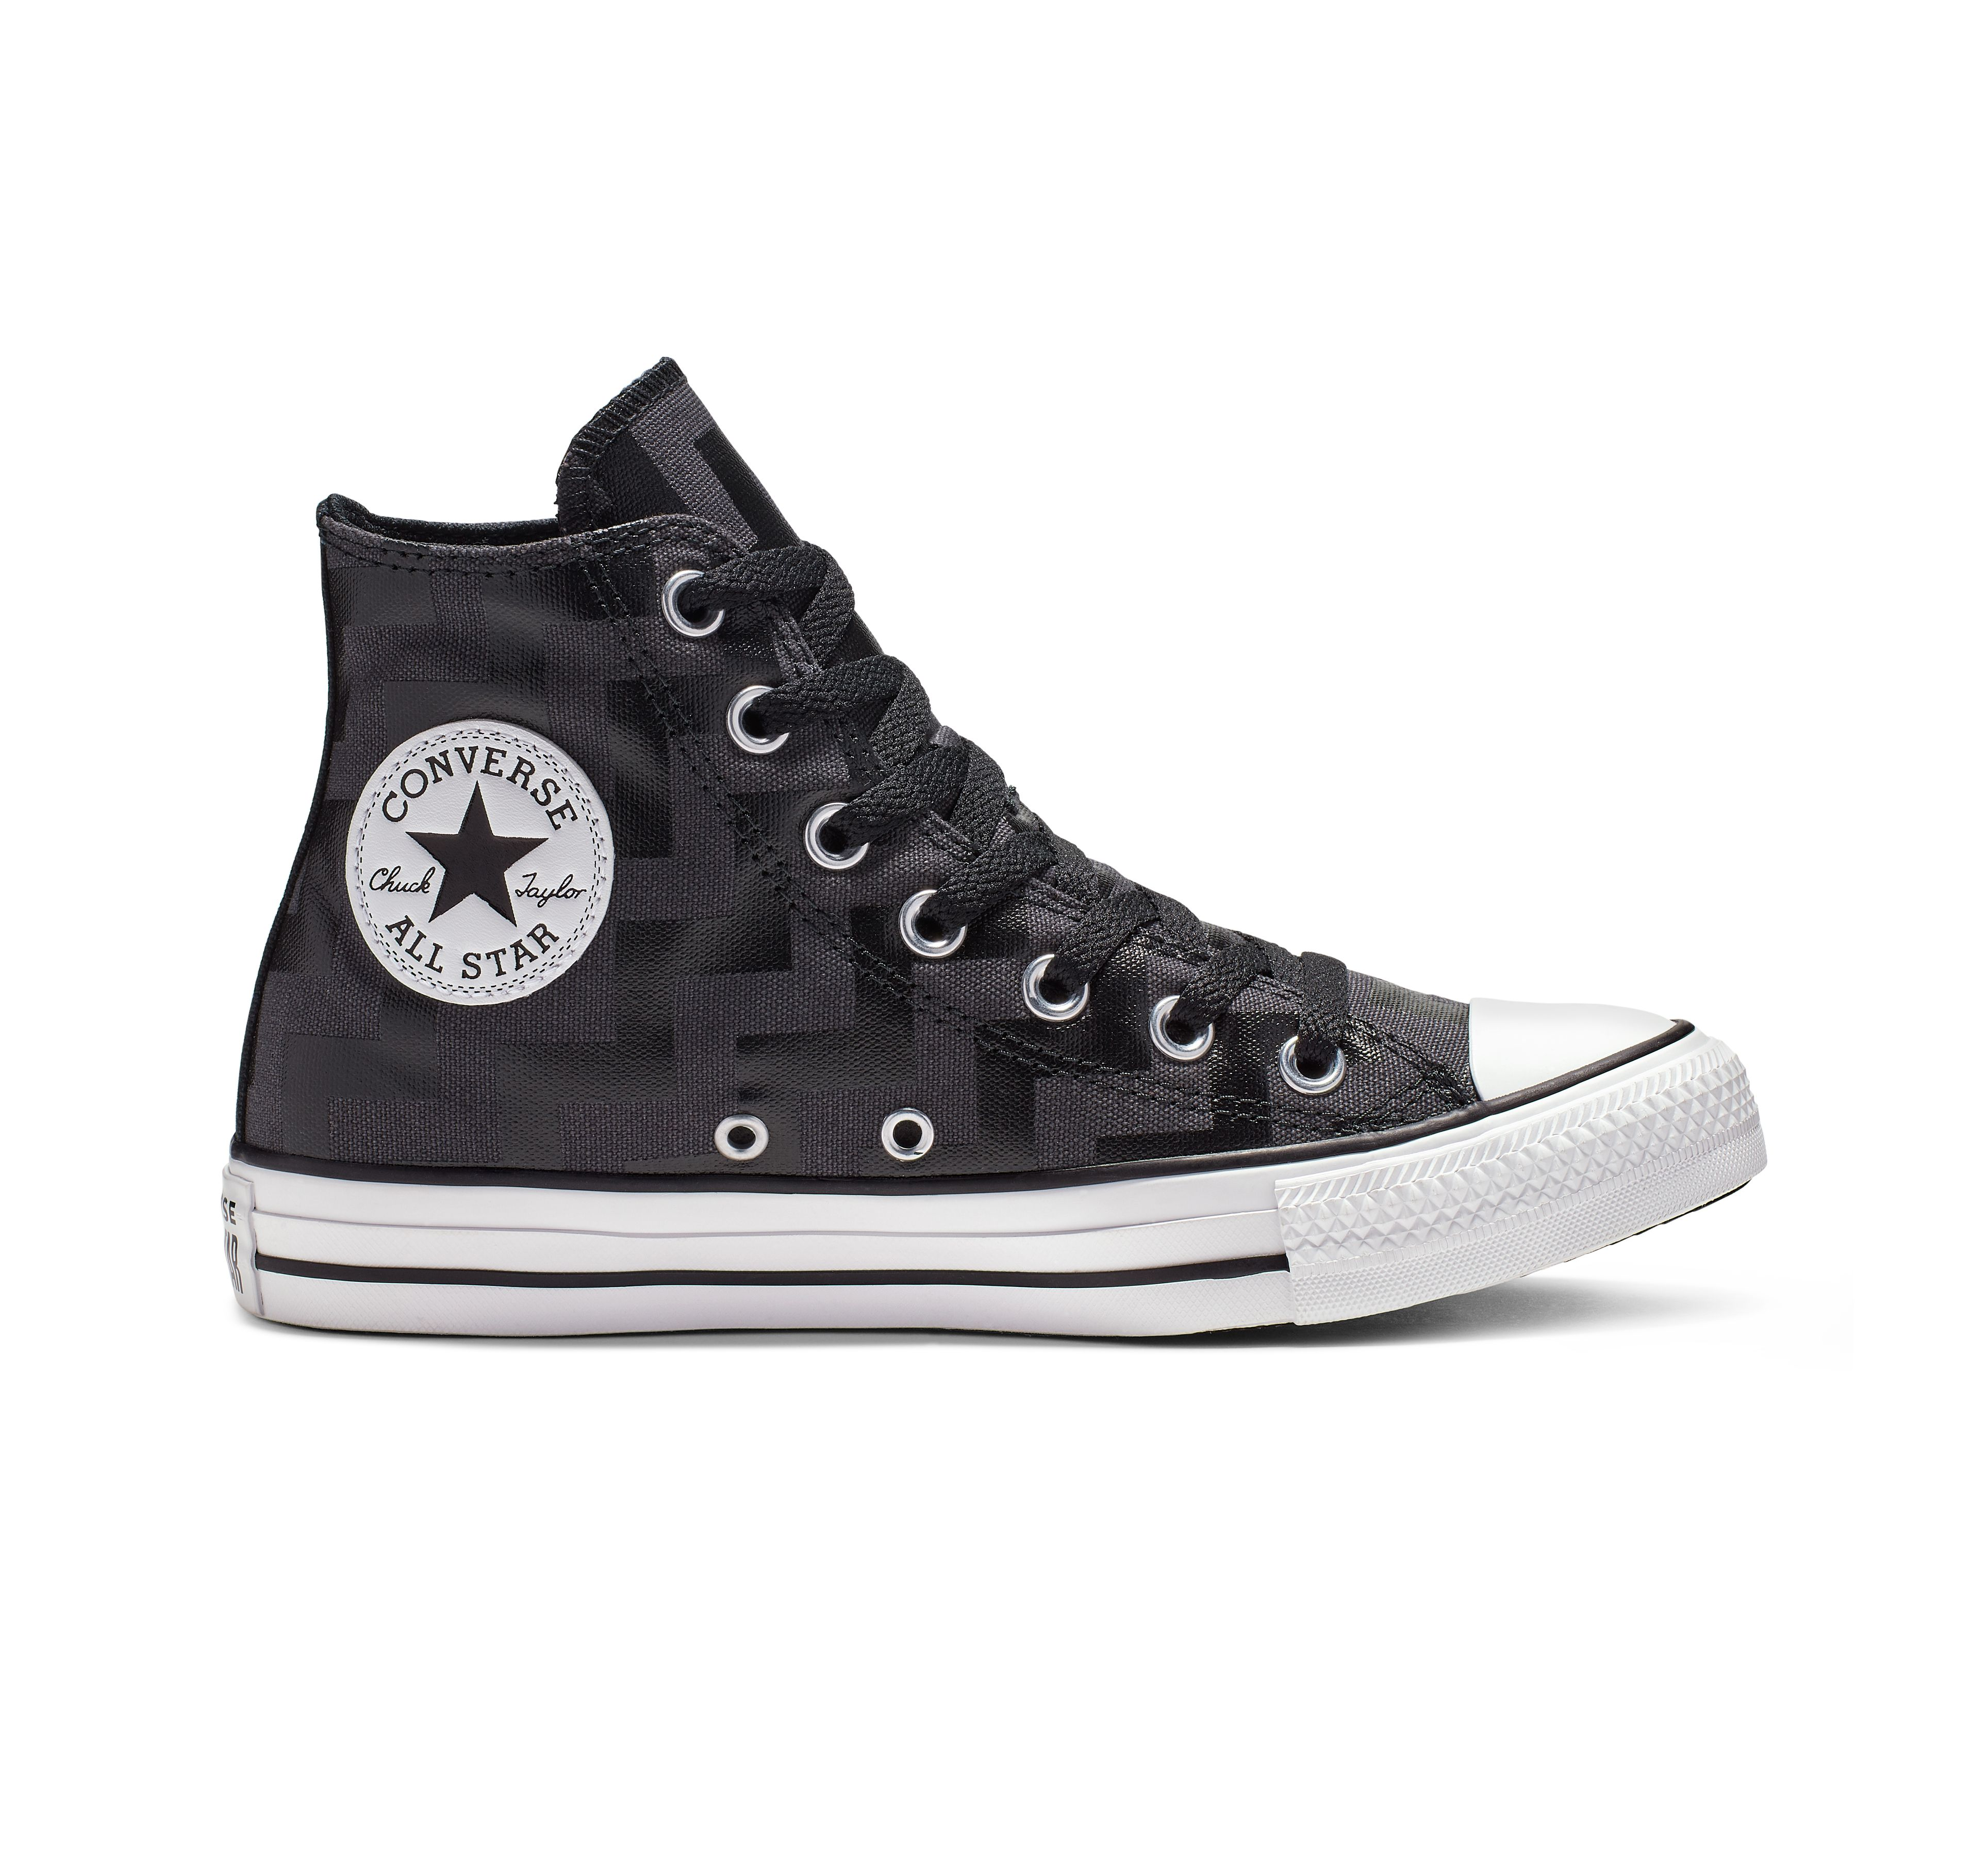 Chuck Taylor All Star Glam Dunk High Top | Chuck taylors